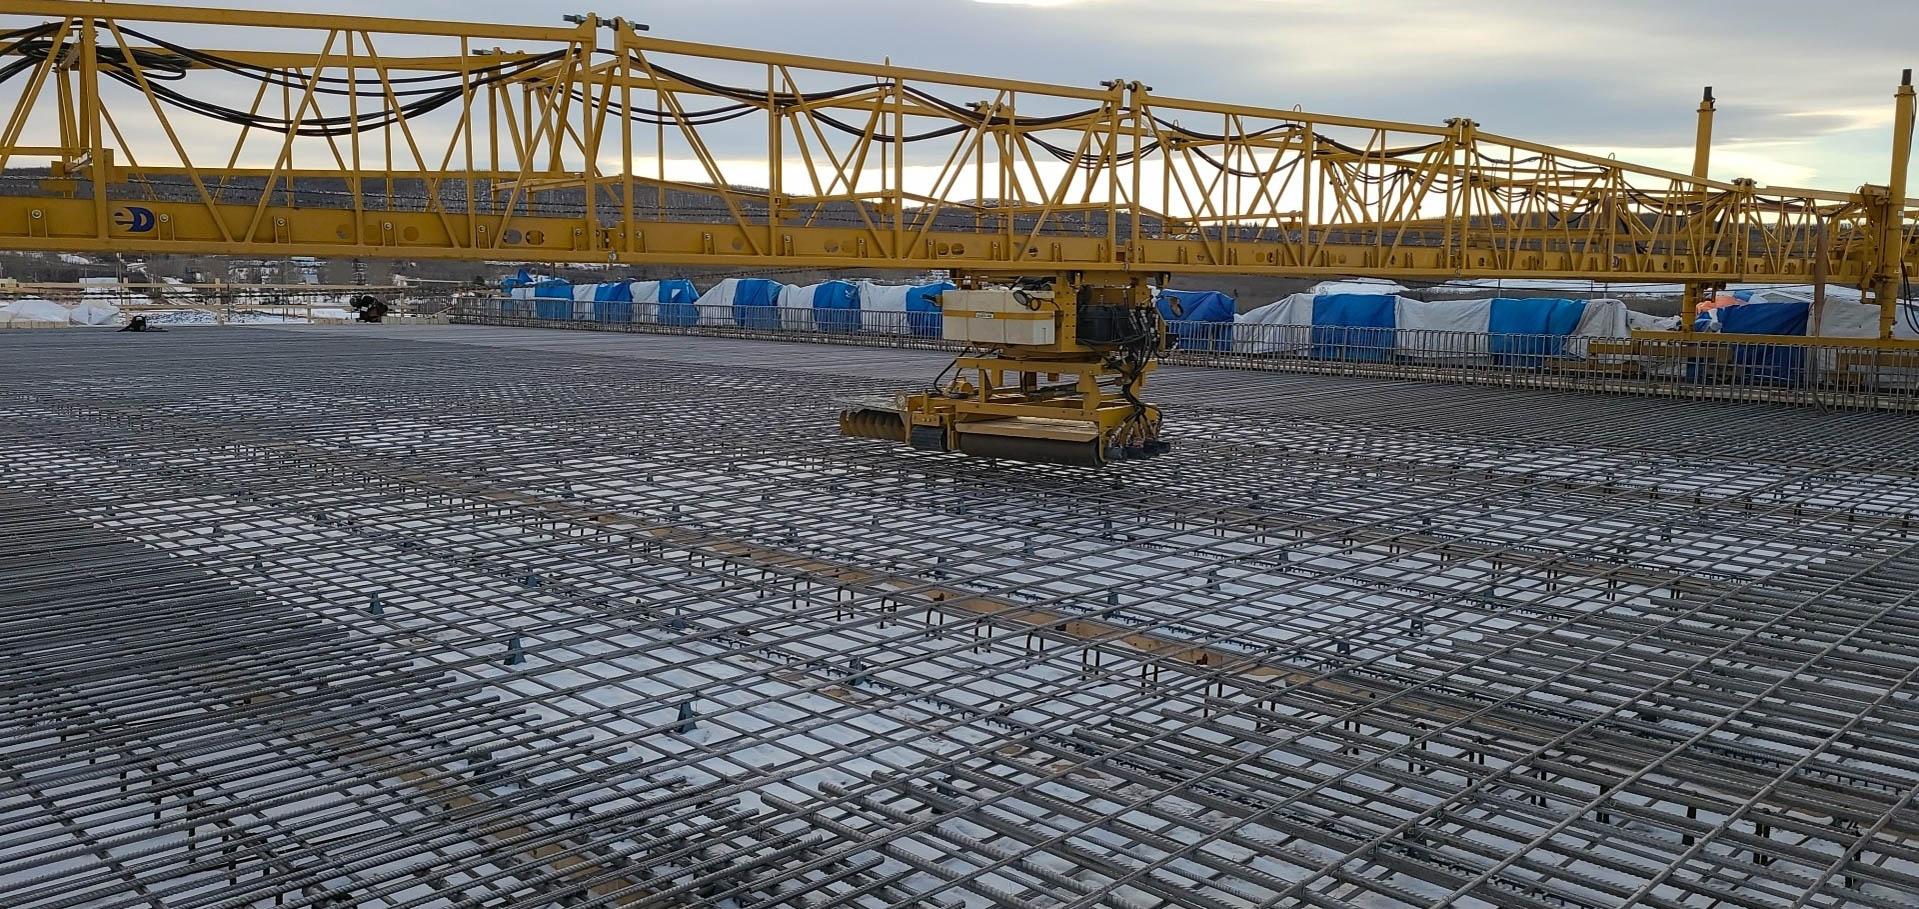 deck rebar concrete dry run